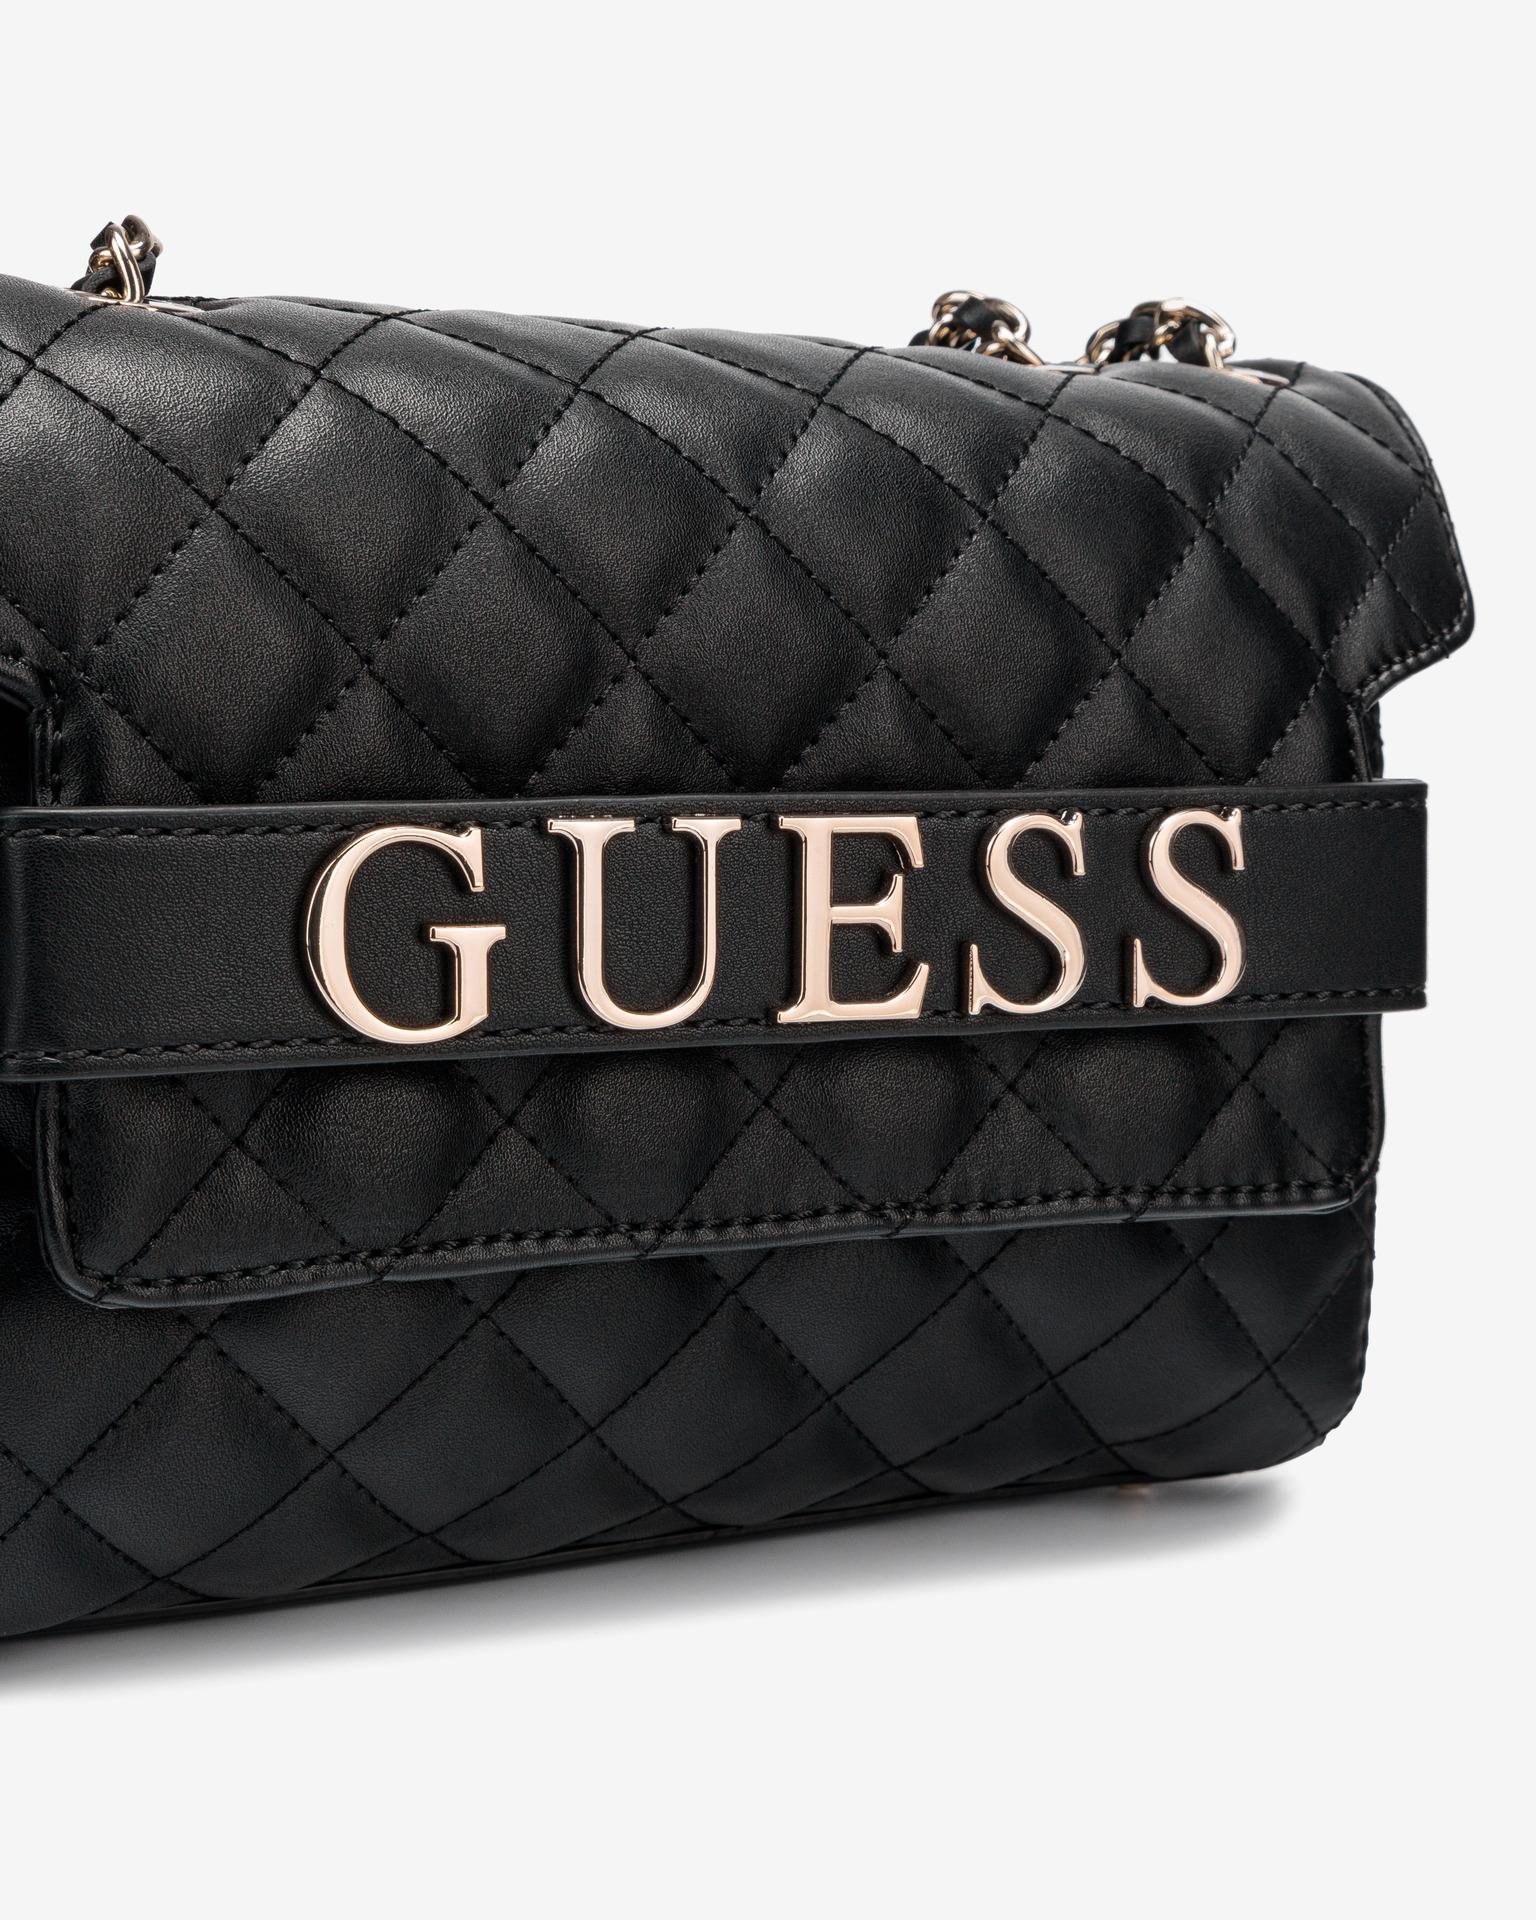 Guess black crossbody handbag Illy Convertibe